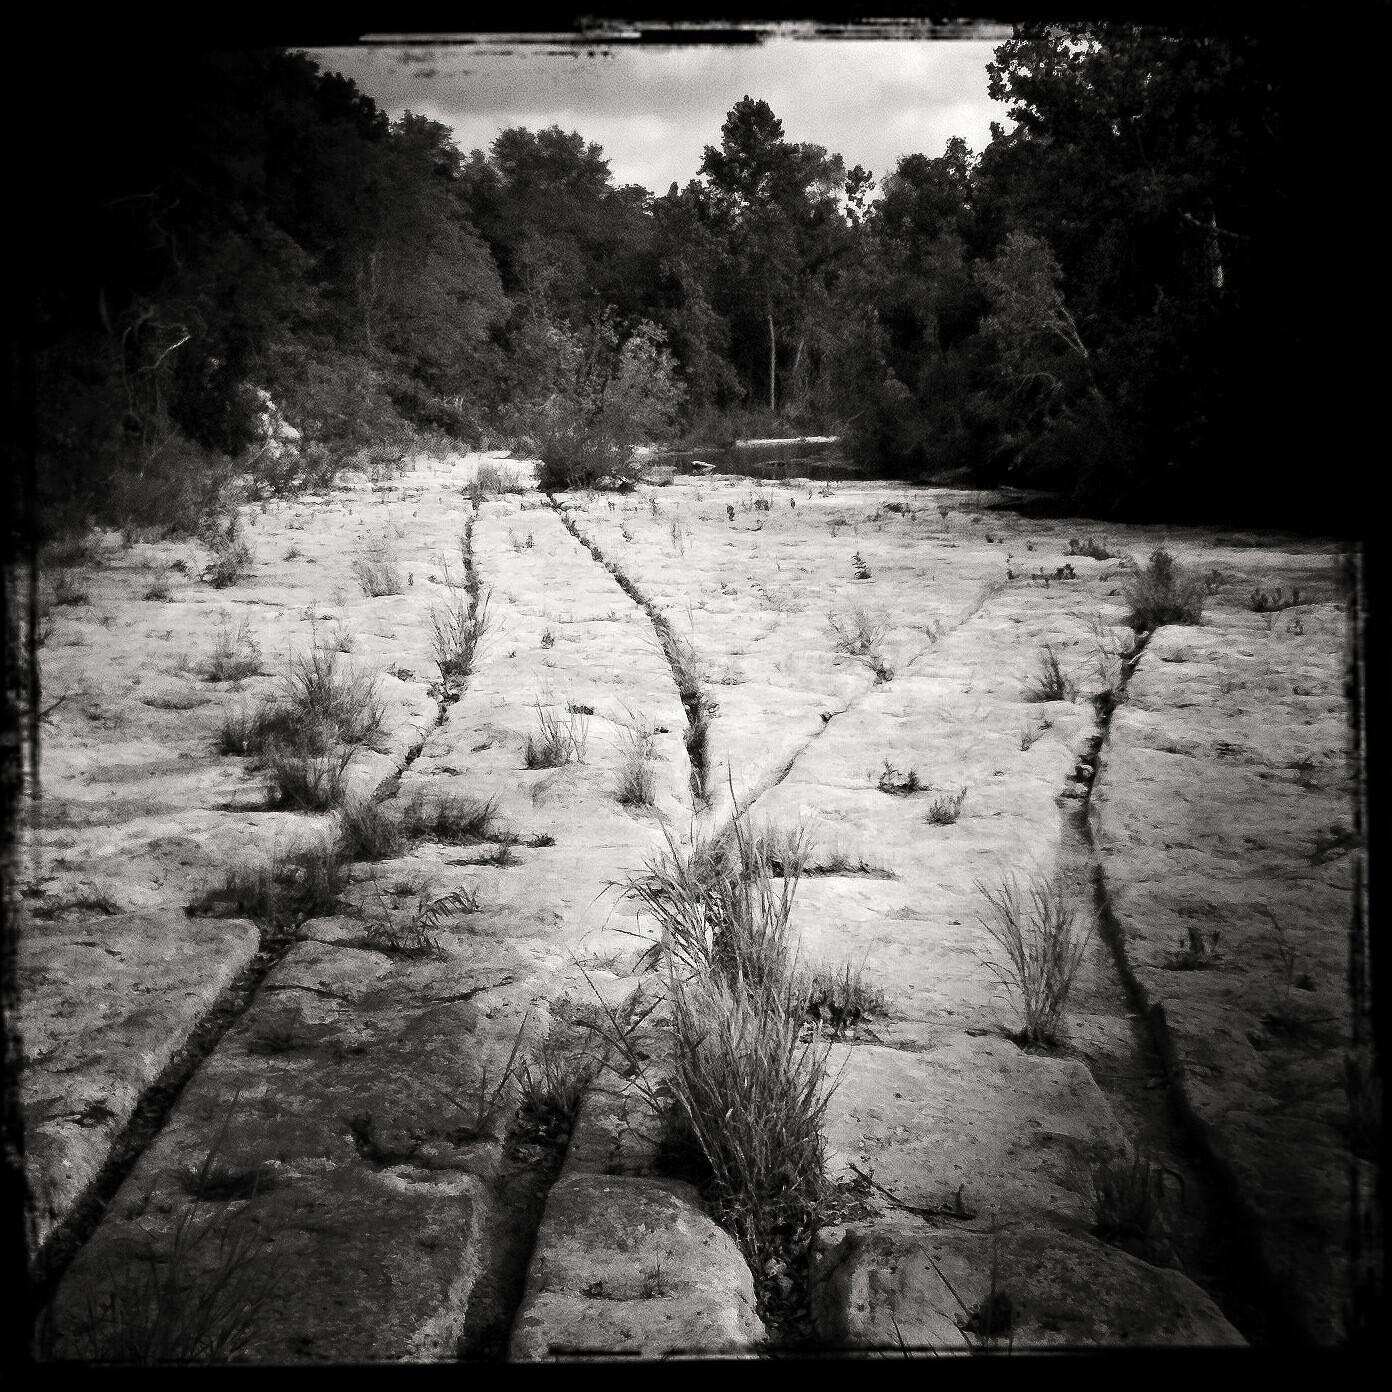 Wagon Tracks, Bull Creek - Austin, TX